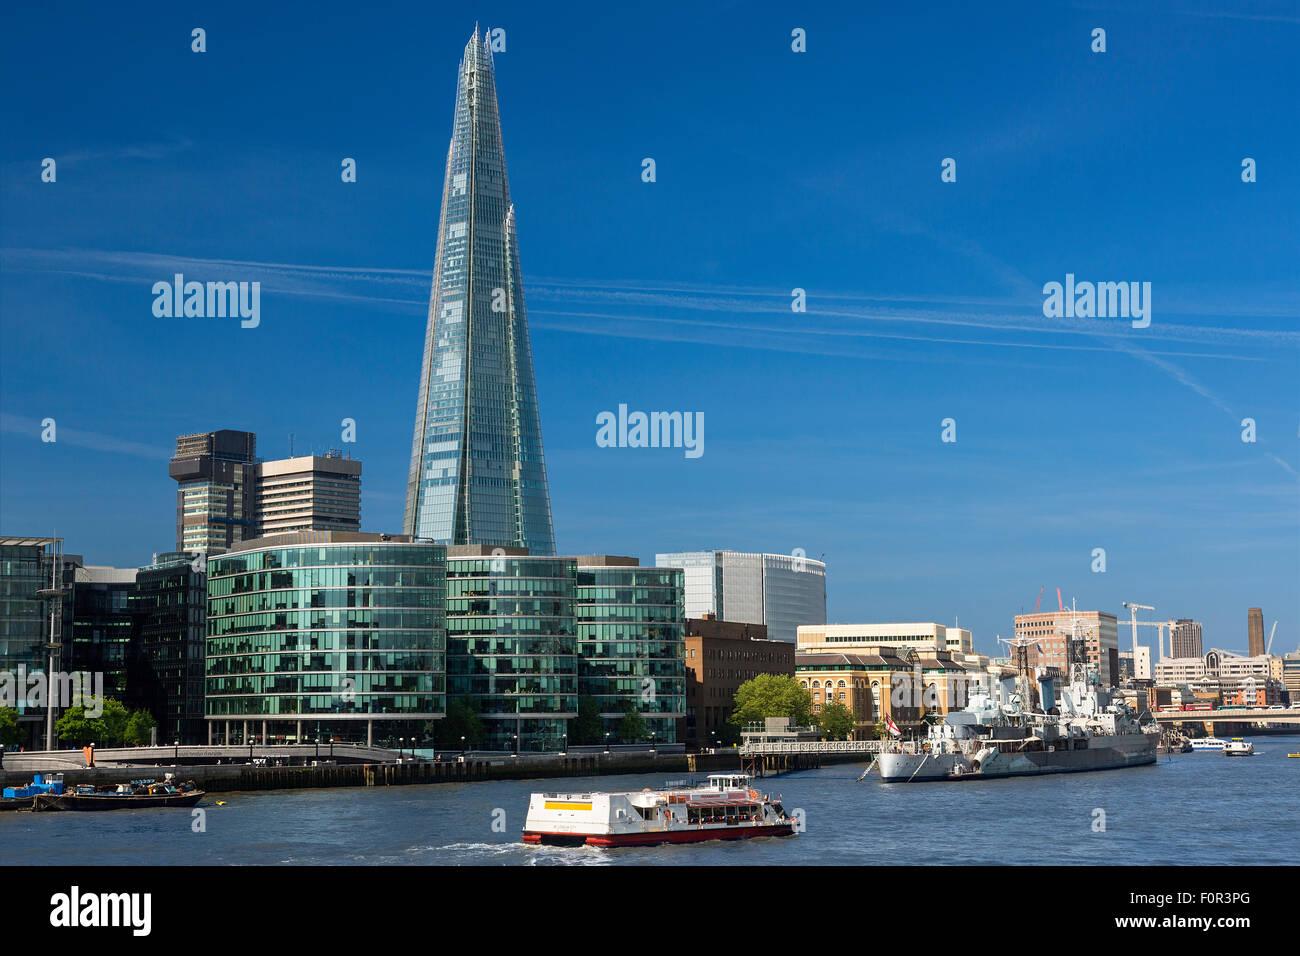 London, Shard London Bridge - Stock Image